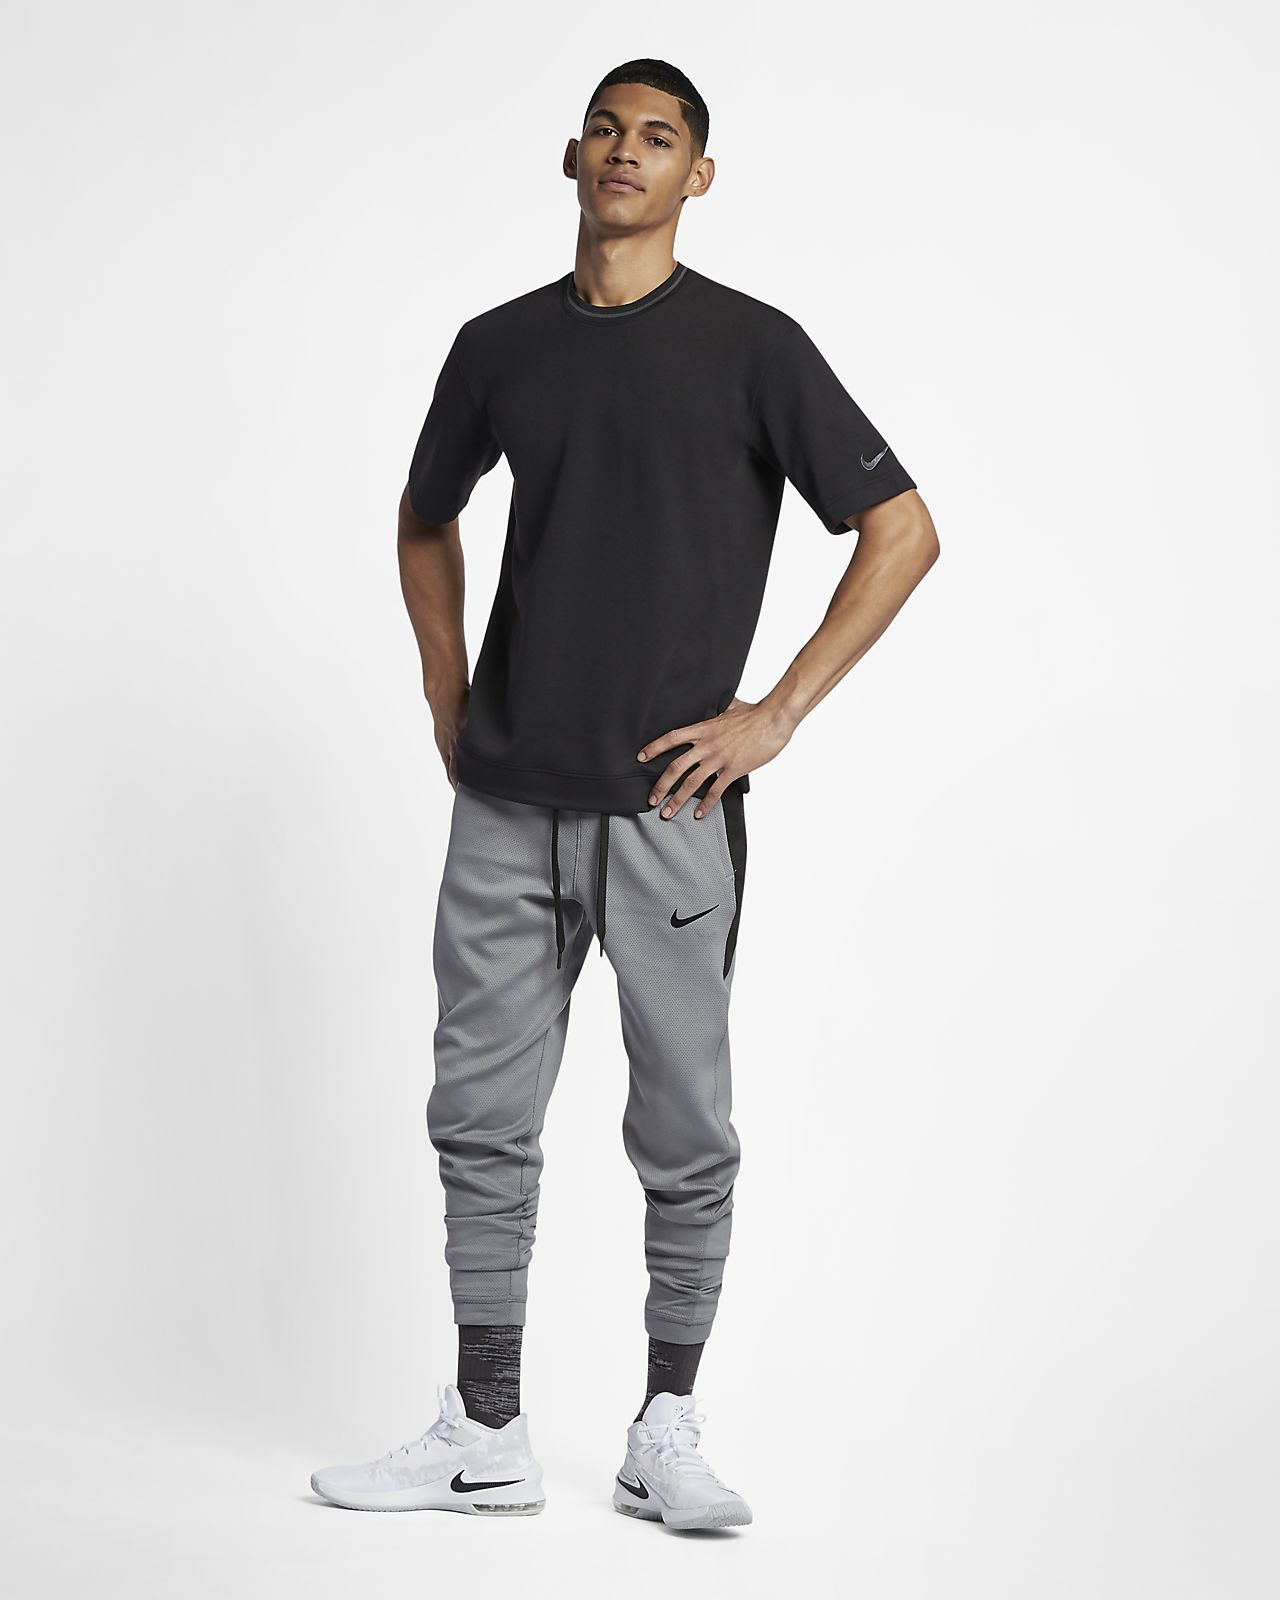 961e51ca9c49e Maglia da basket a manica corta Nike Dri-FIT - Uomo. Nike.com IT